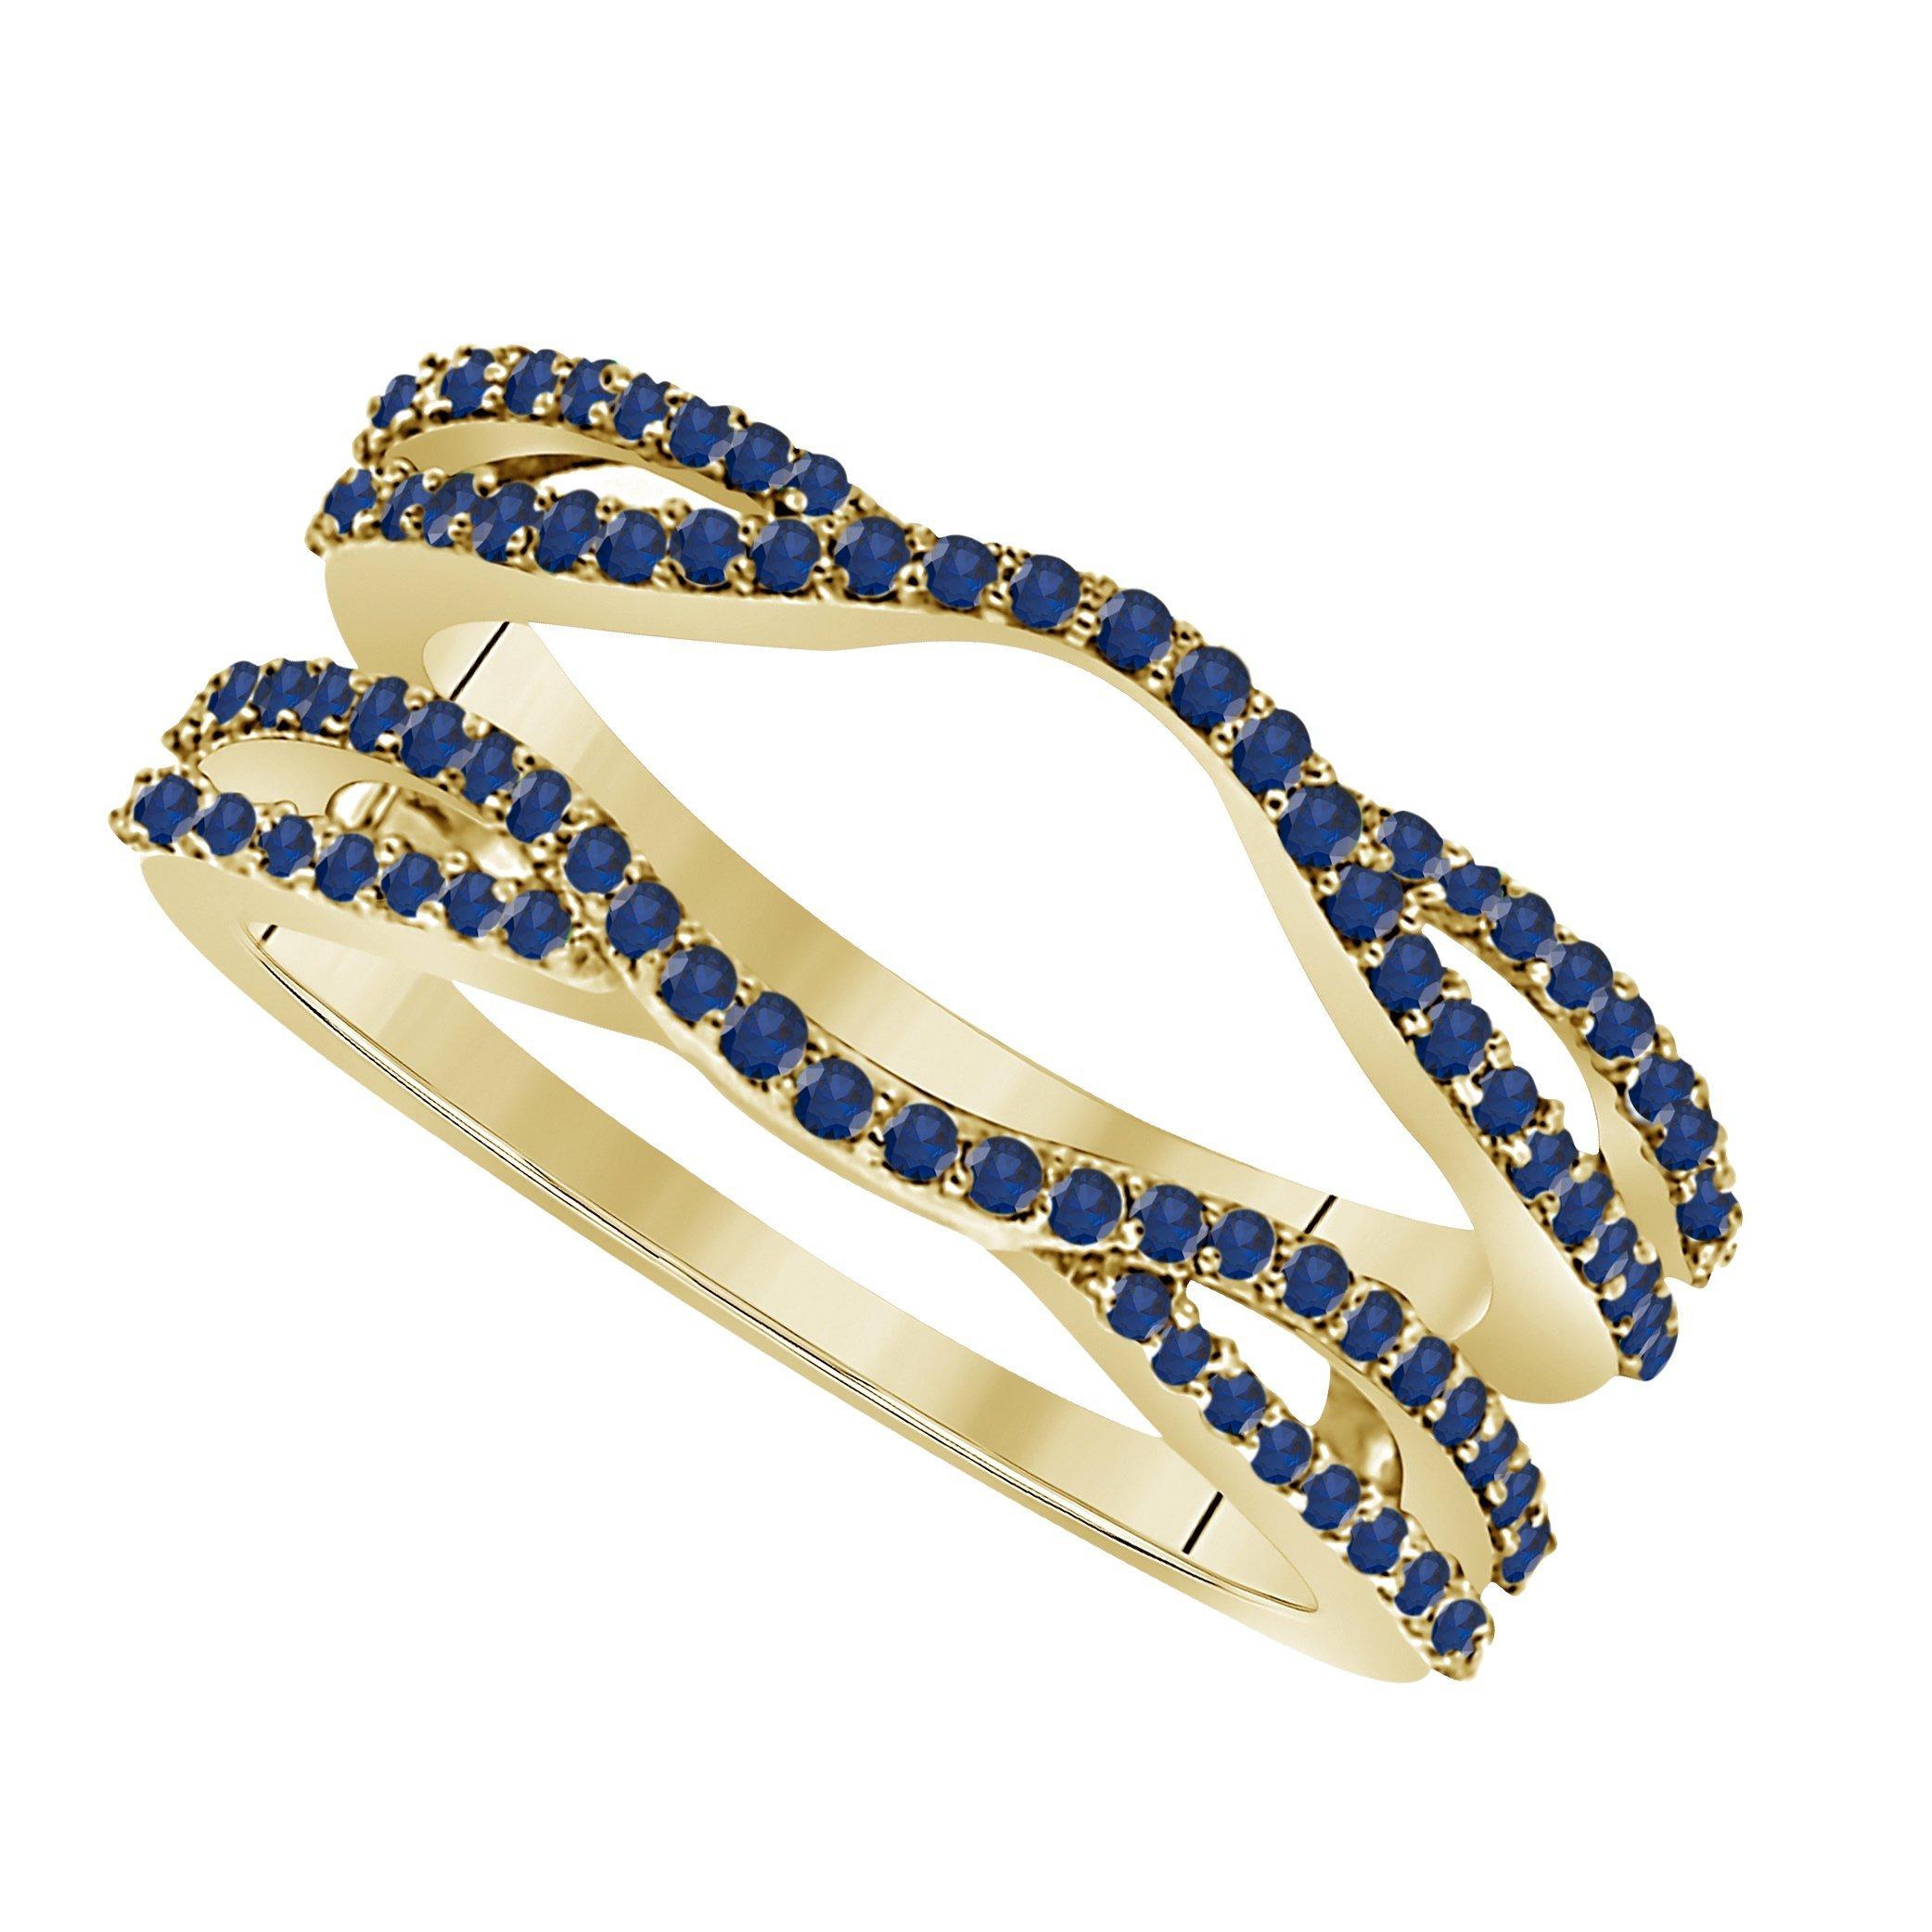 Star Retail 1/2 Ct 14K Yellow Gold Finish Round Cut Lab Created Blue Sapphire Ladies Anniversary Wedding Band Enhancer Guard Double Chevron Ring